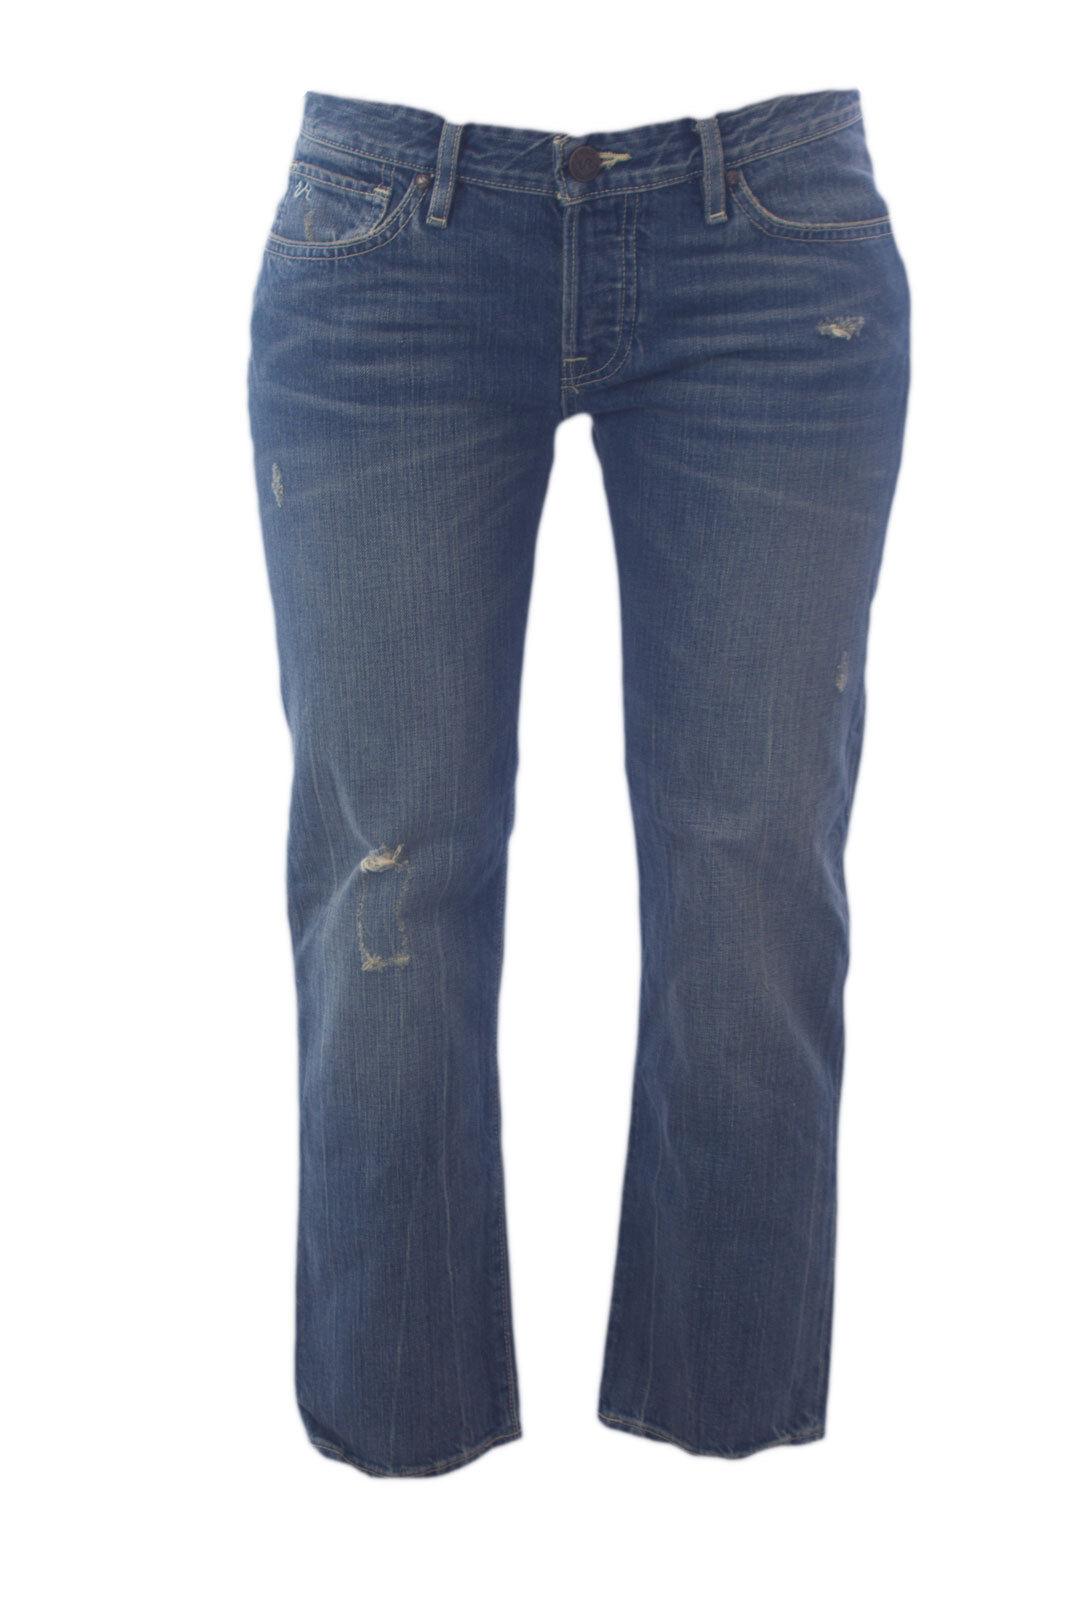 Vintage Revolution Damen Antik Abgenutzt Freundin Ausschnitt Jeans 2wgrsxrd Nwt